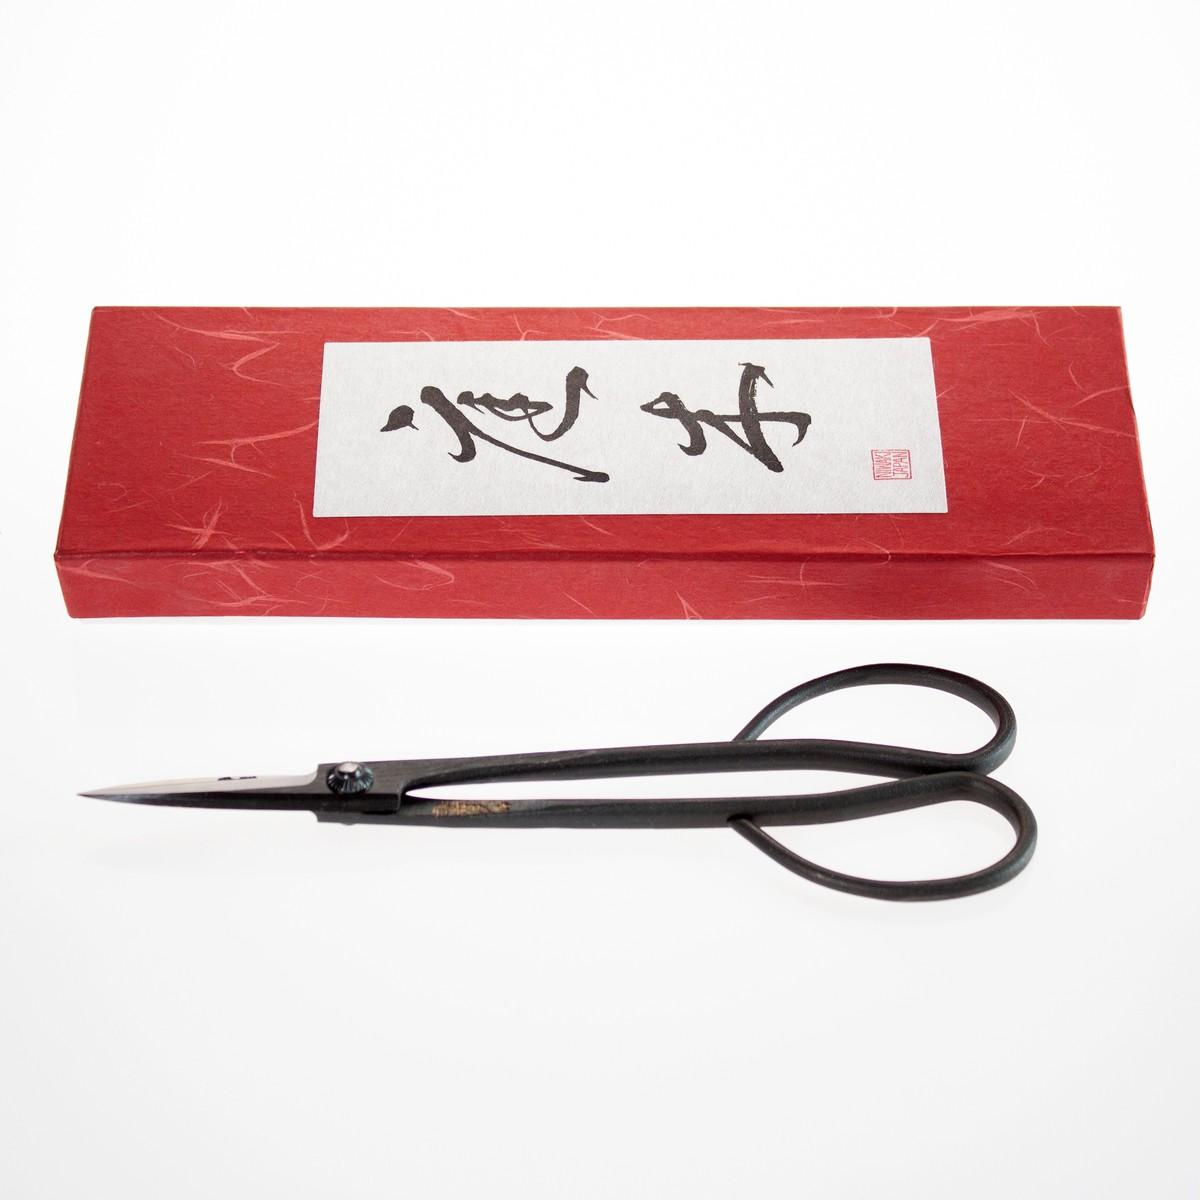 Photo of Sentei Bonsai Scissors